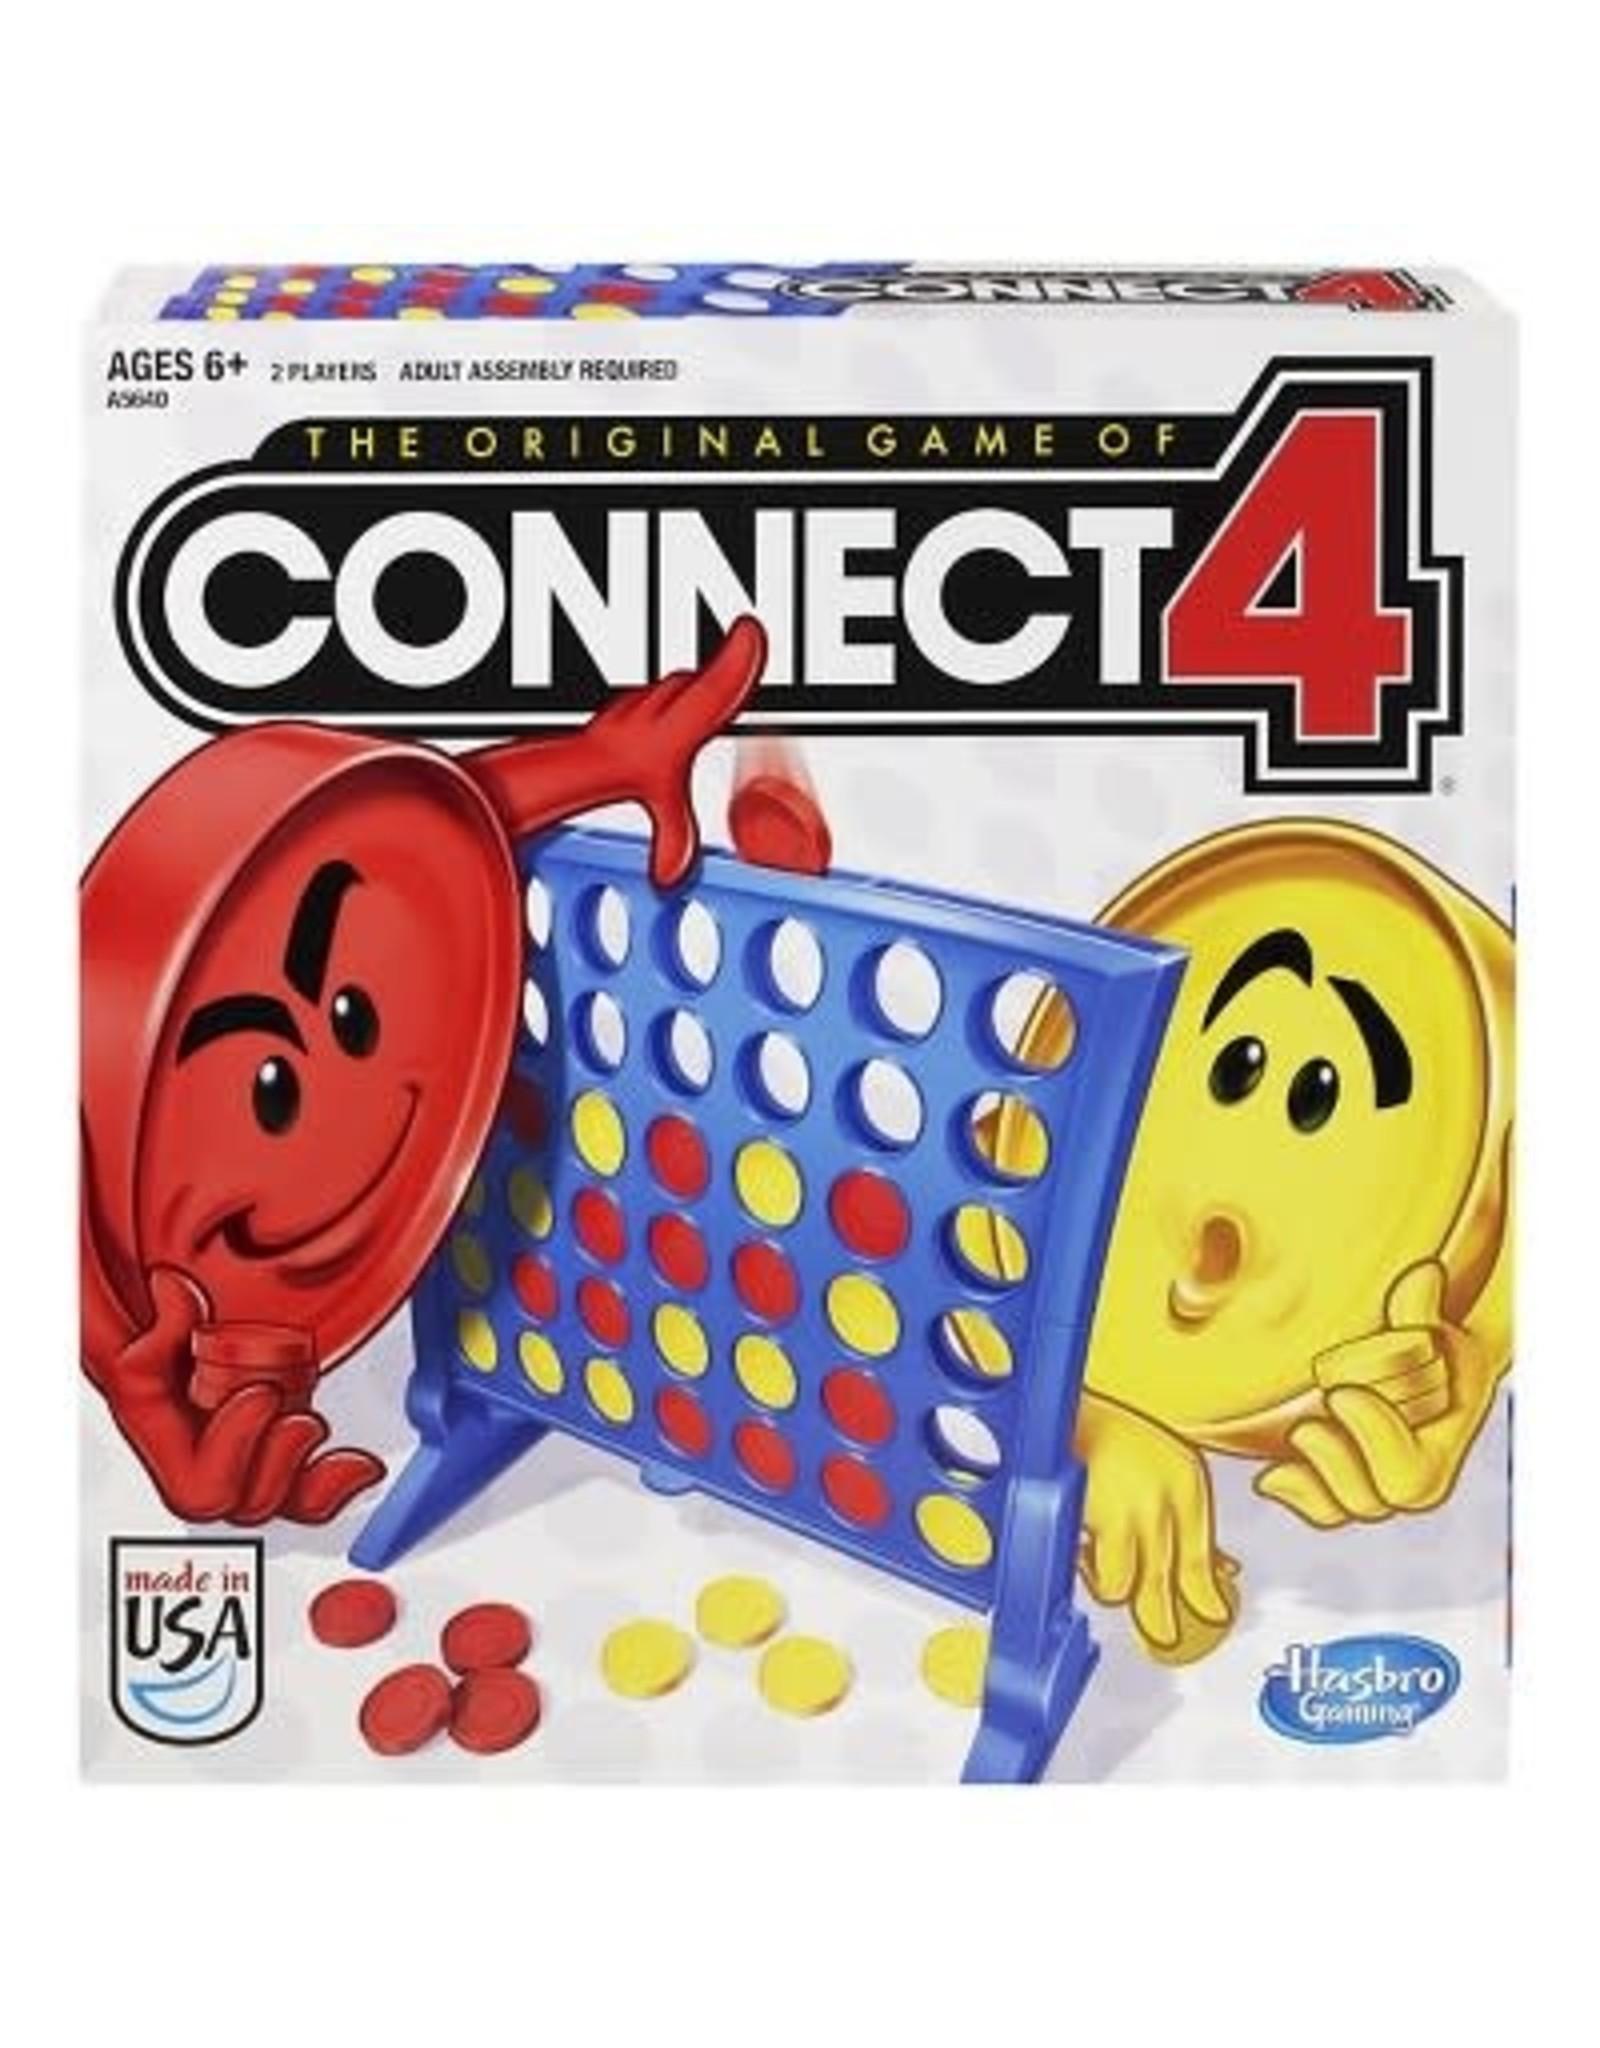 Hasbro Gaming CONNECT4